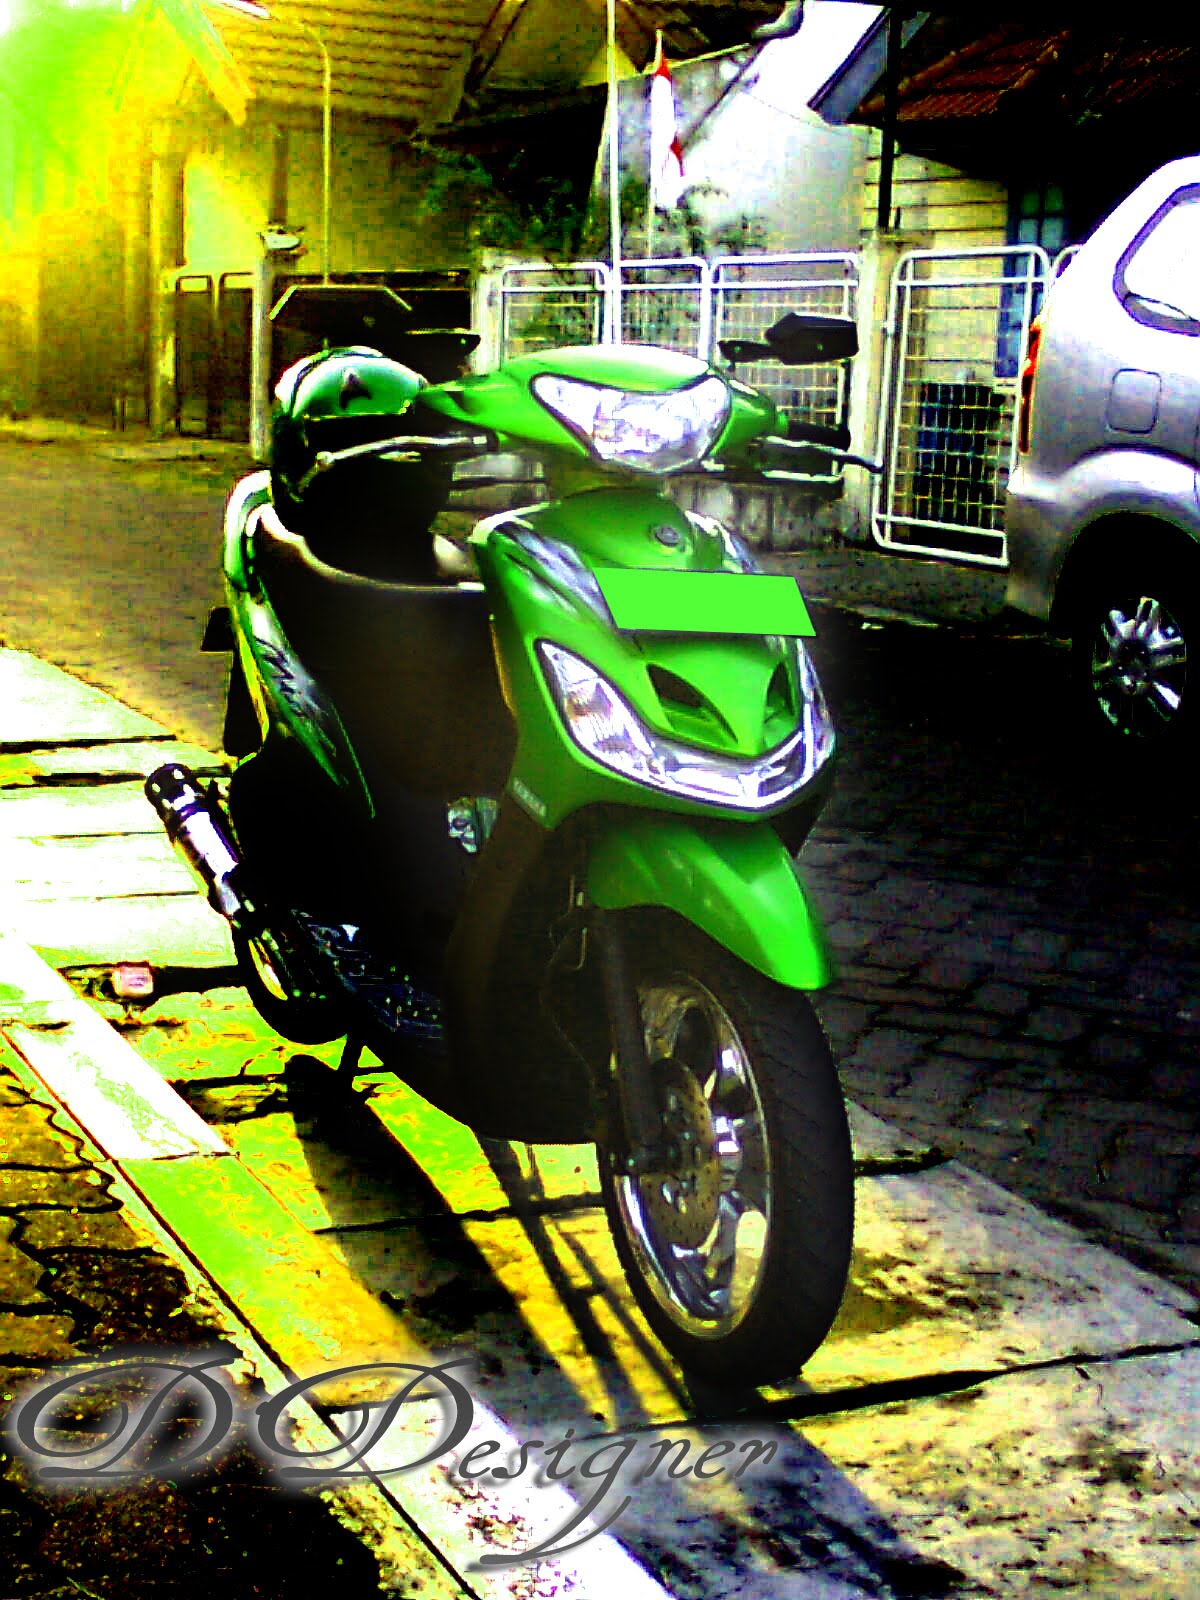 Modif Yamaha Alfa Modifikasi Motor Yamaha